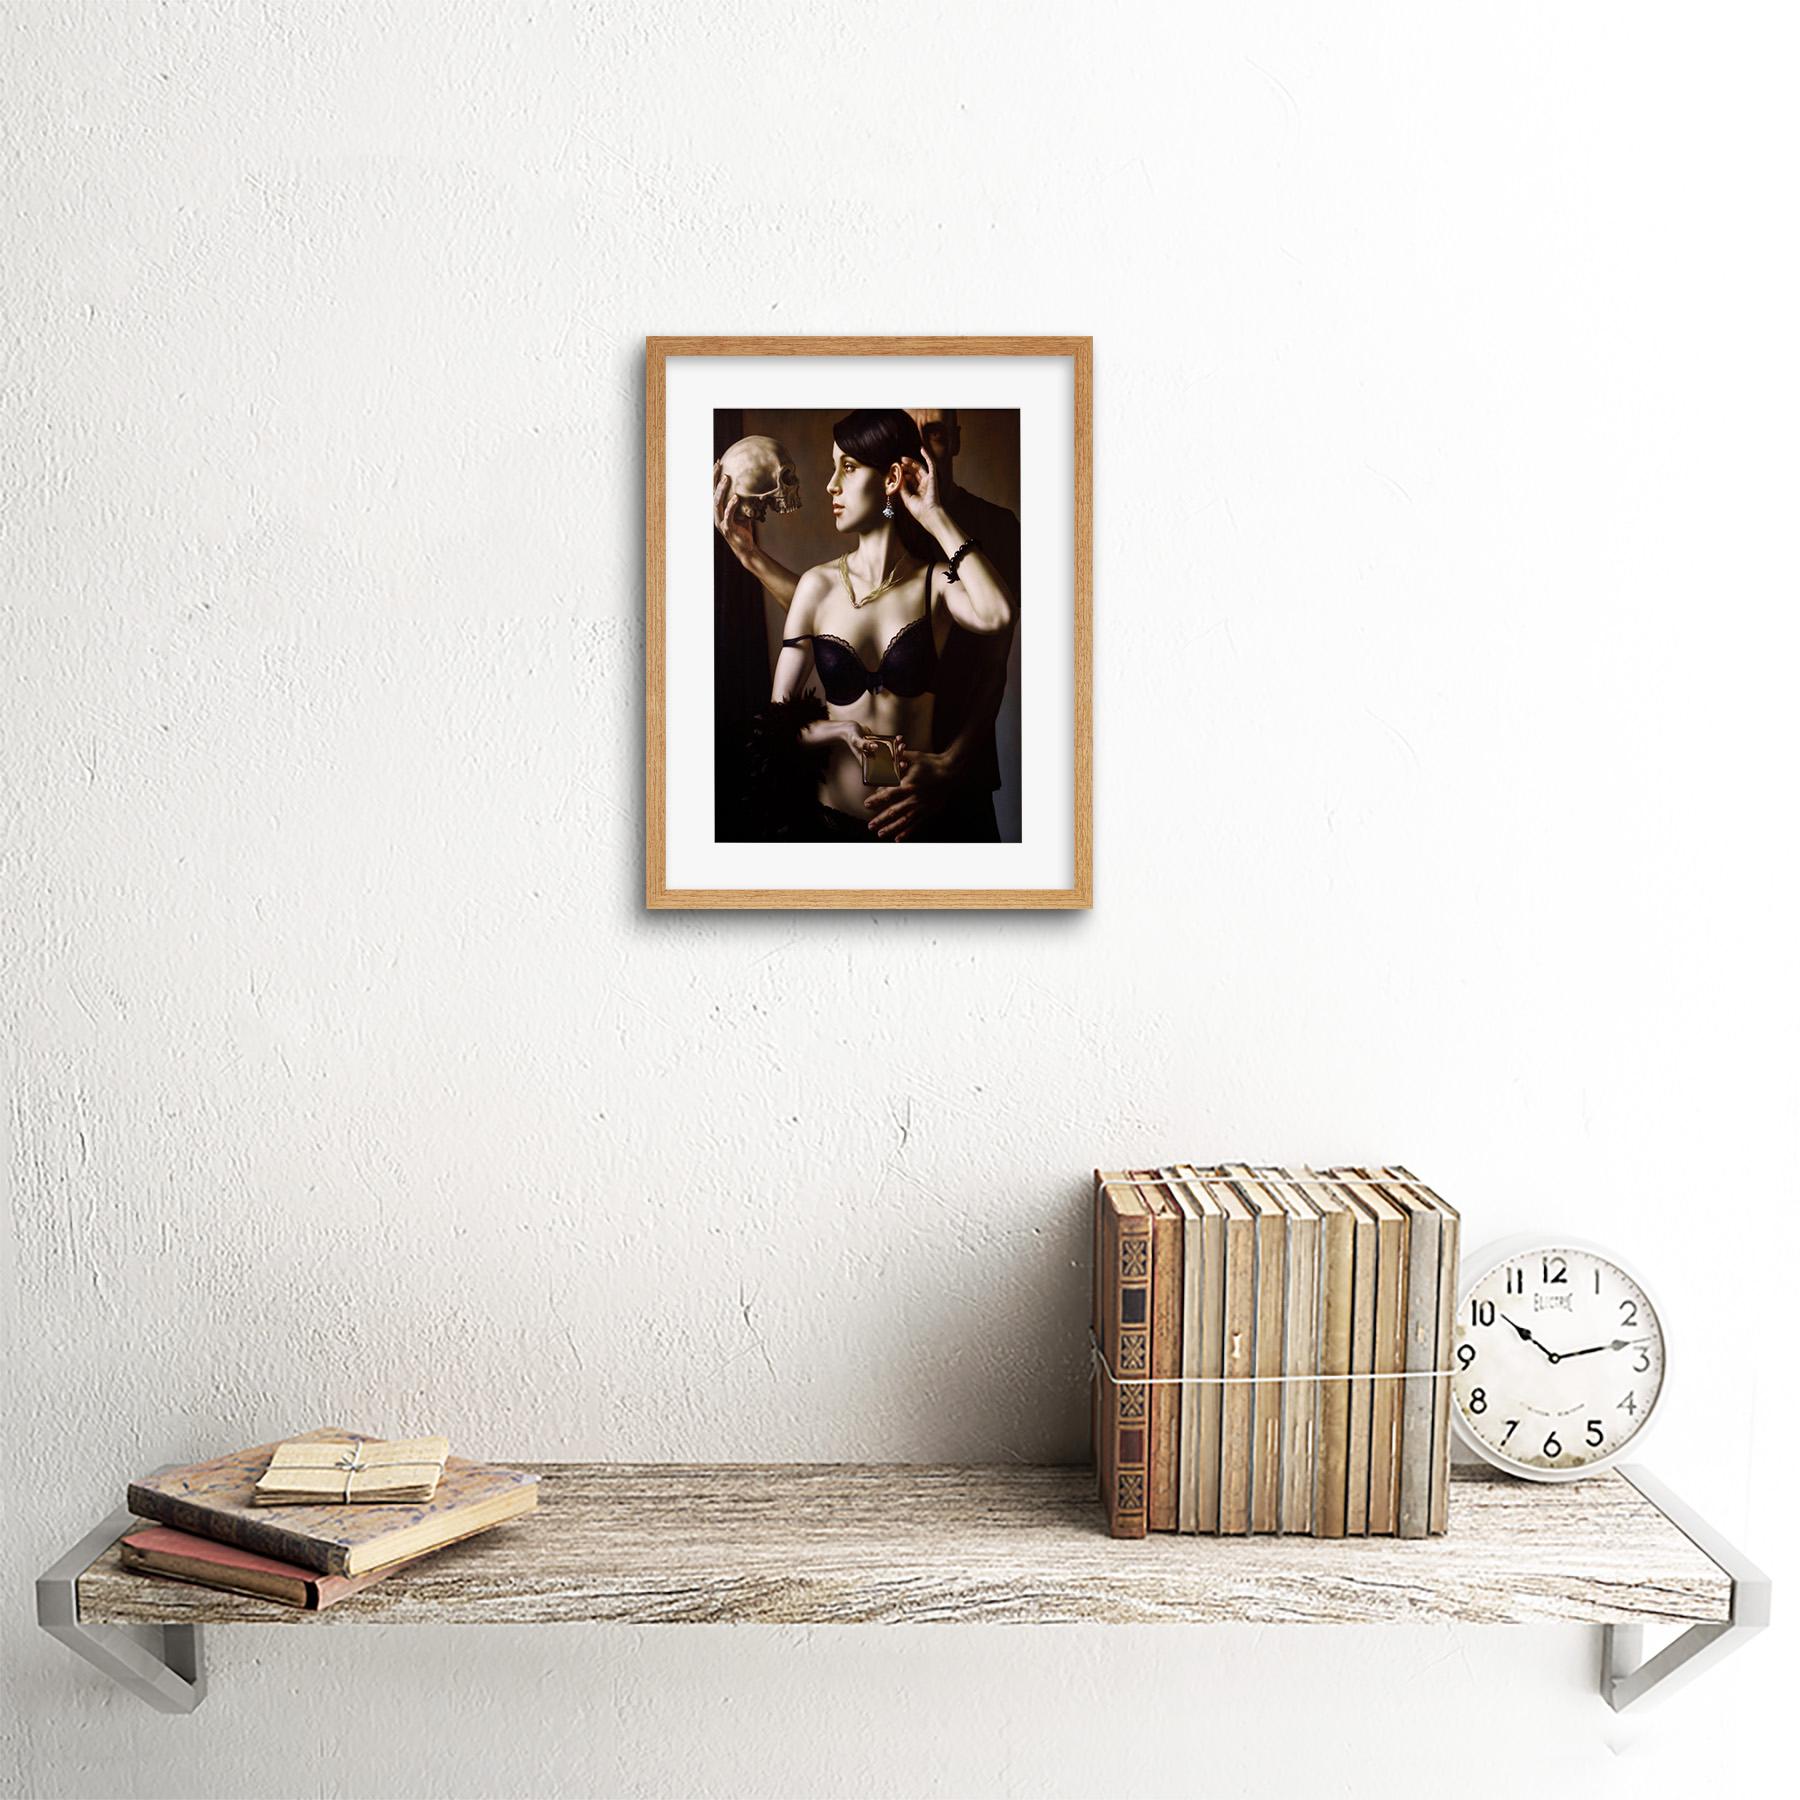 Painting-Balcar-Send-Me-To-The-Future-Framed-Art-Print-9x7-Inch 縮圖 13